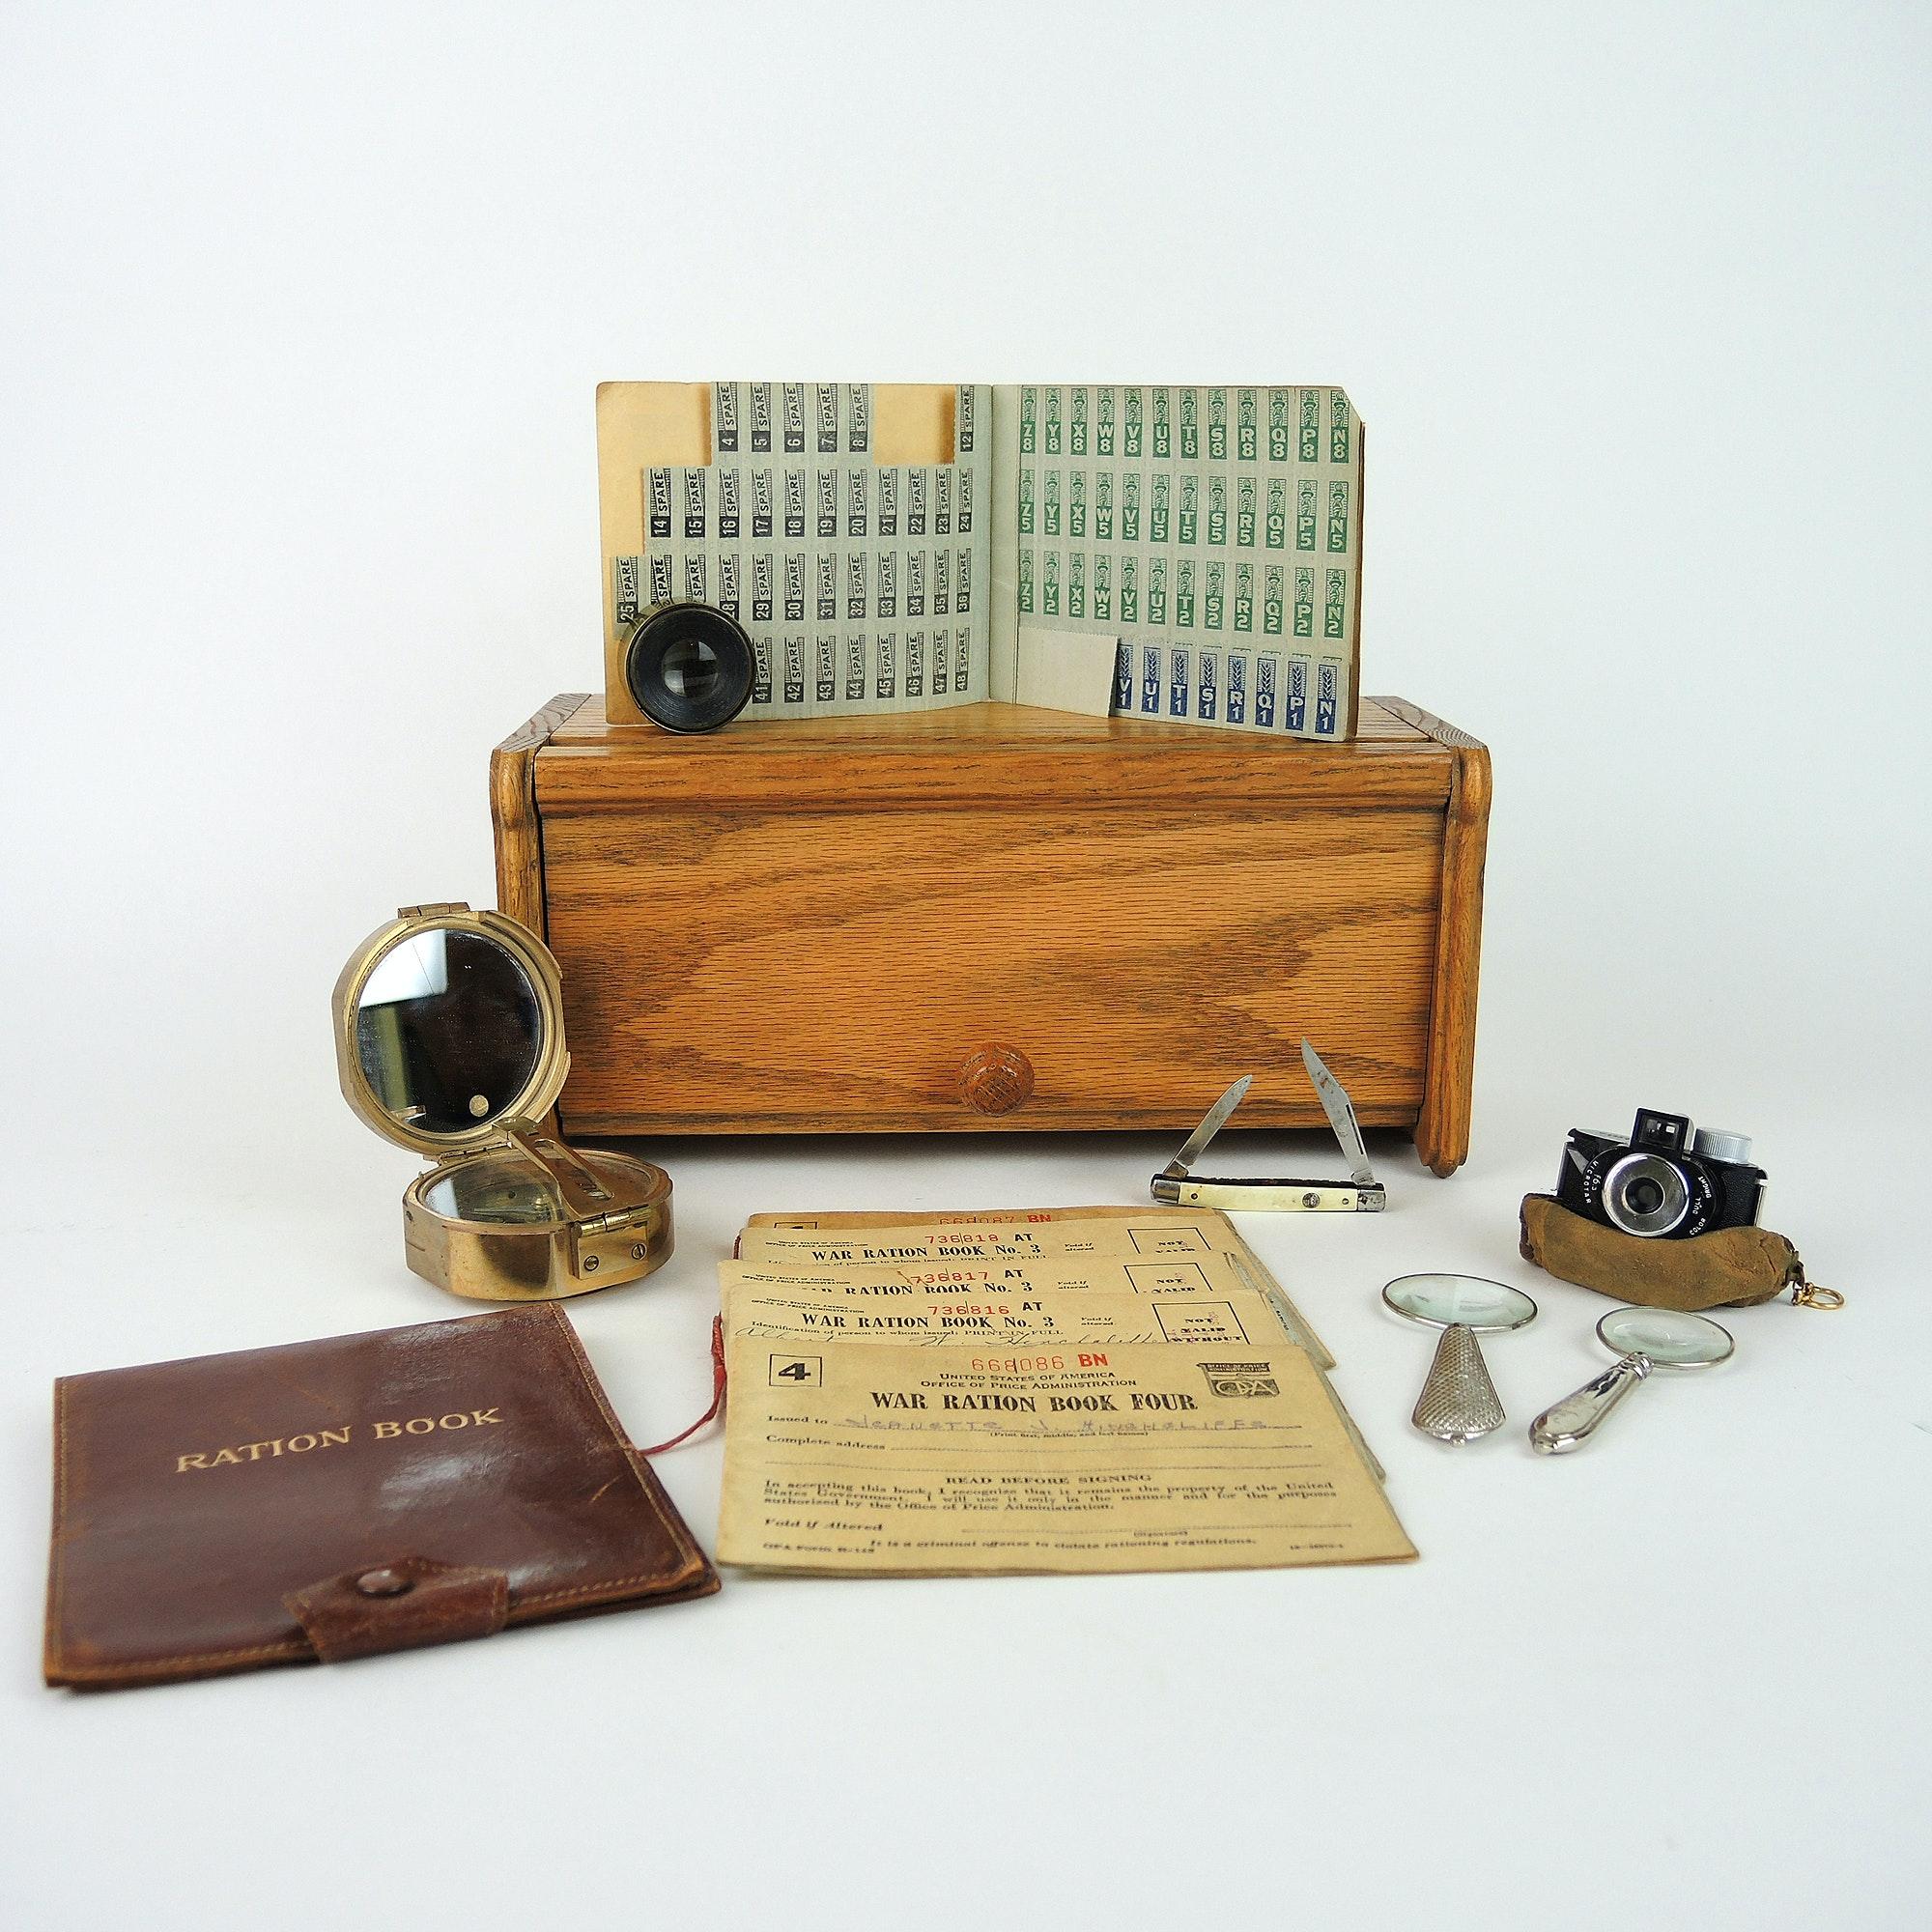 Vintage War Era Ration Books, Desk Accessories and Miniature Film Camera